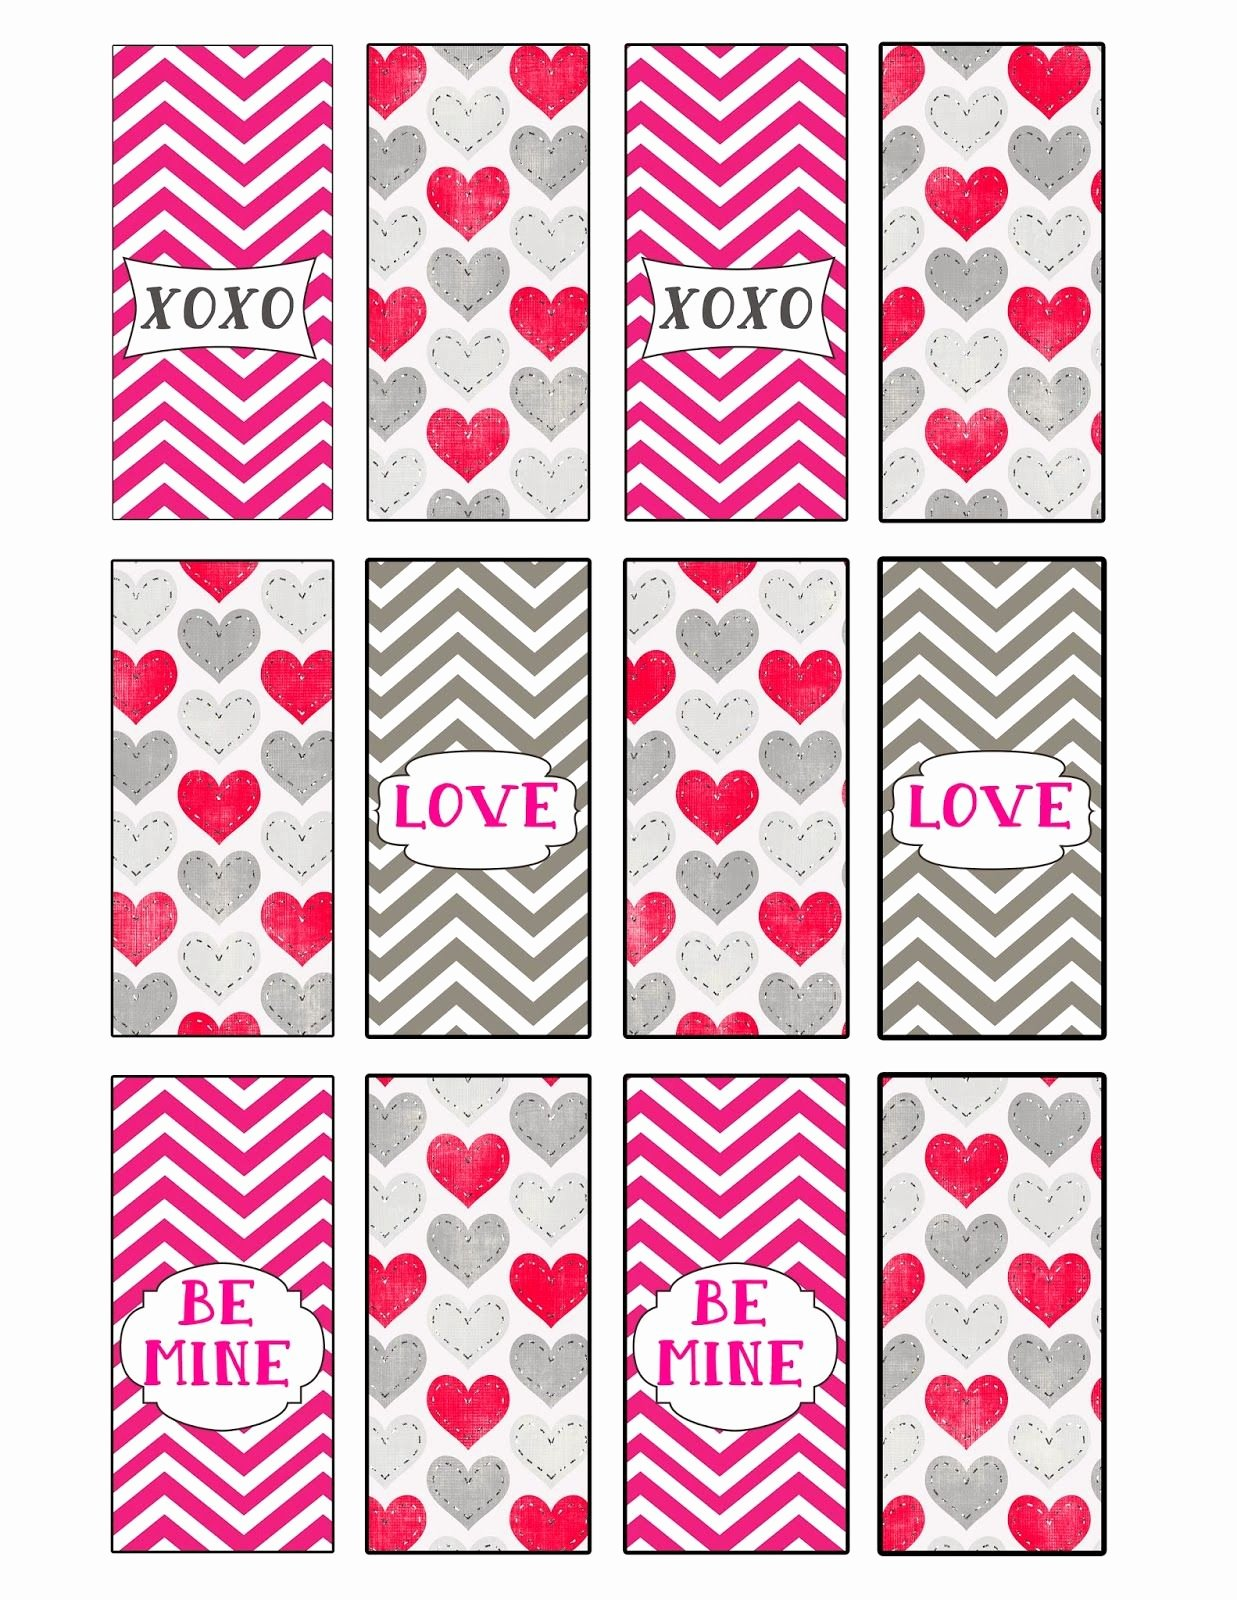 Mini Candy Bar Wrapper Templates Fresh Desert Peach Design Valentines Mini Candy Bar Wrappers